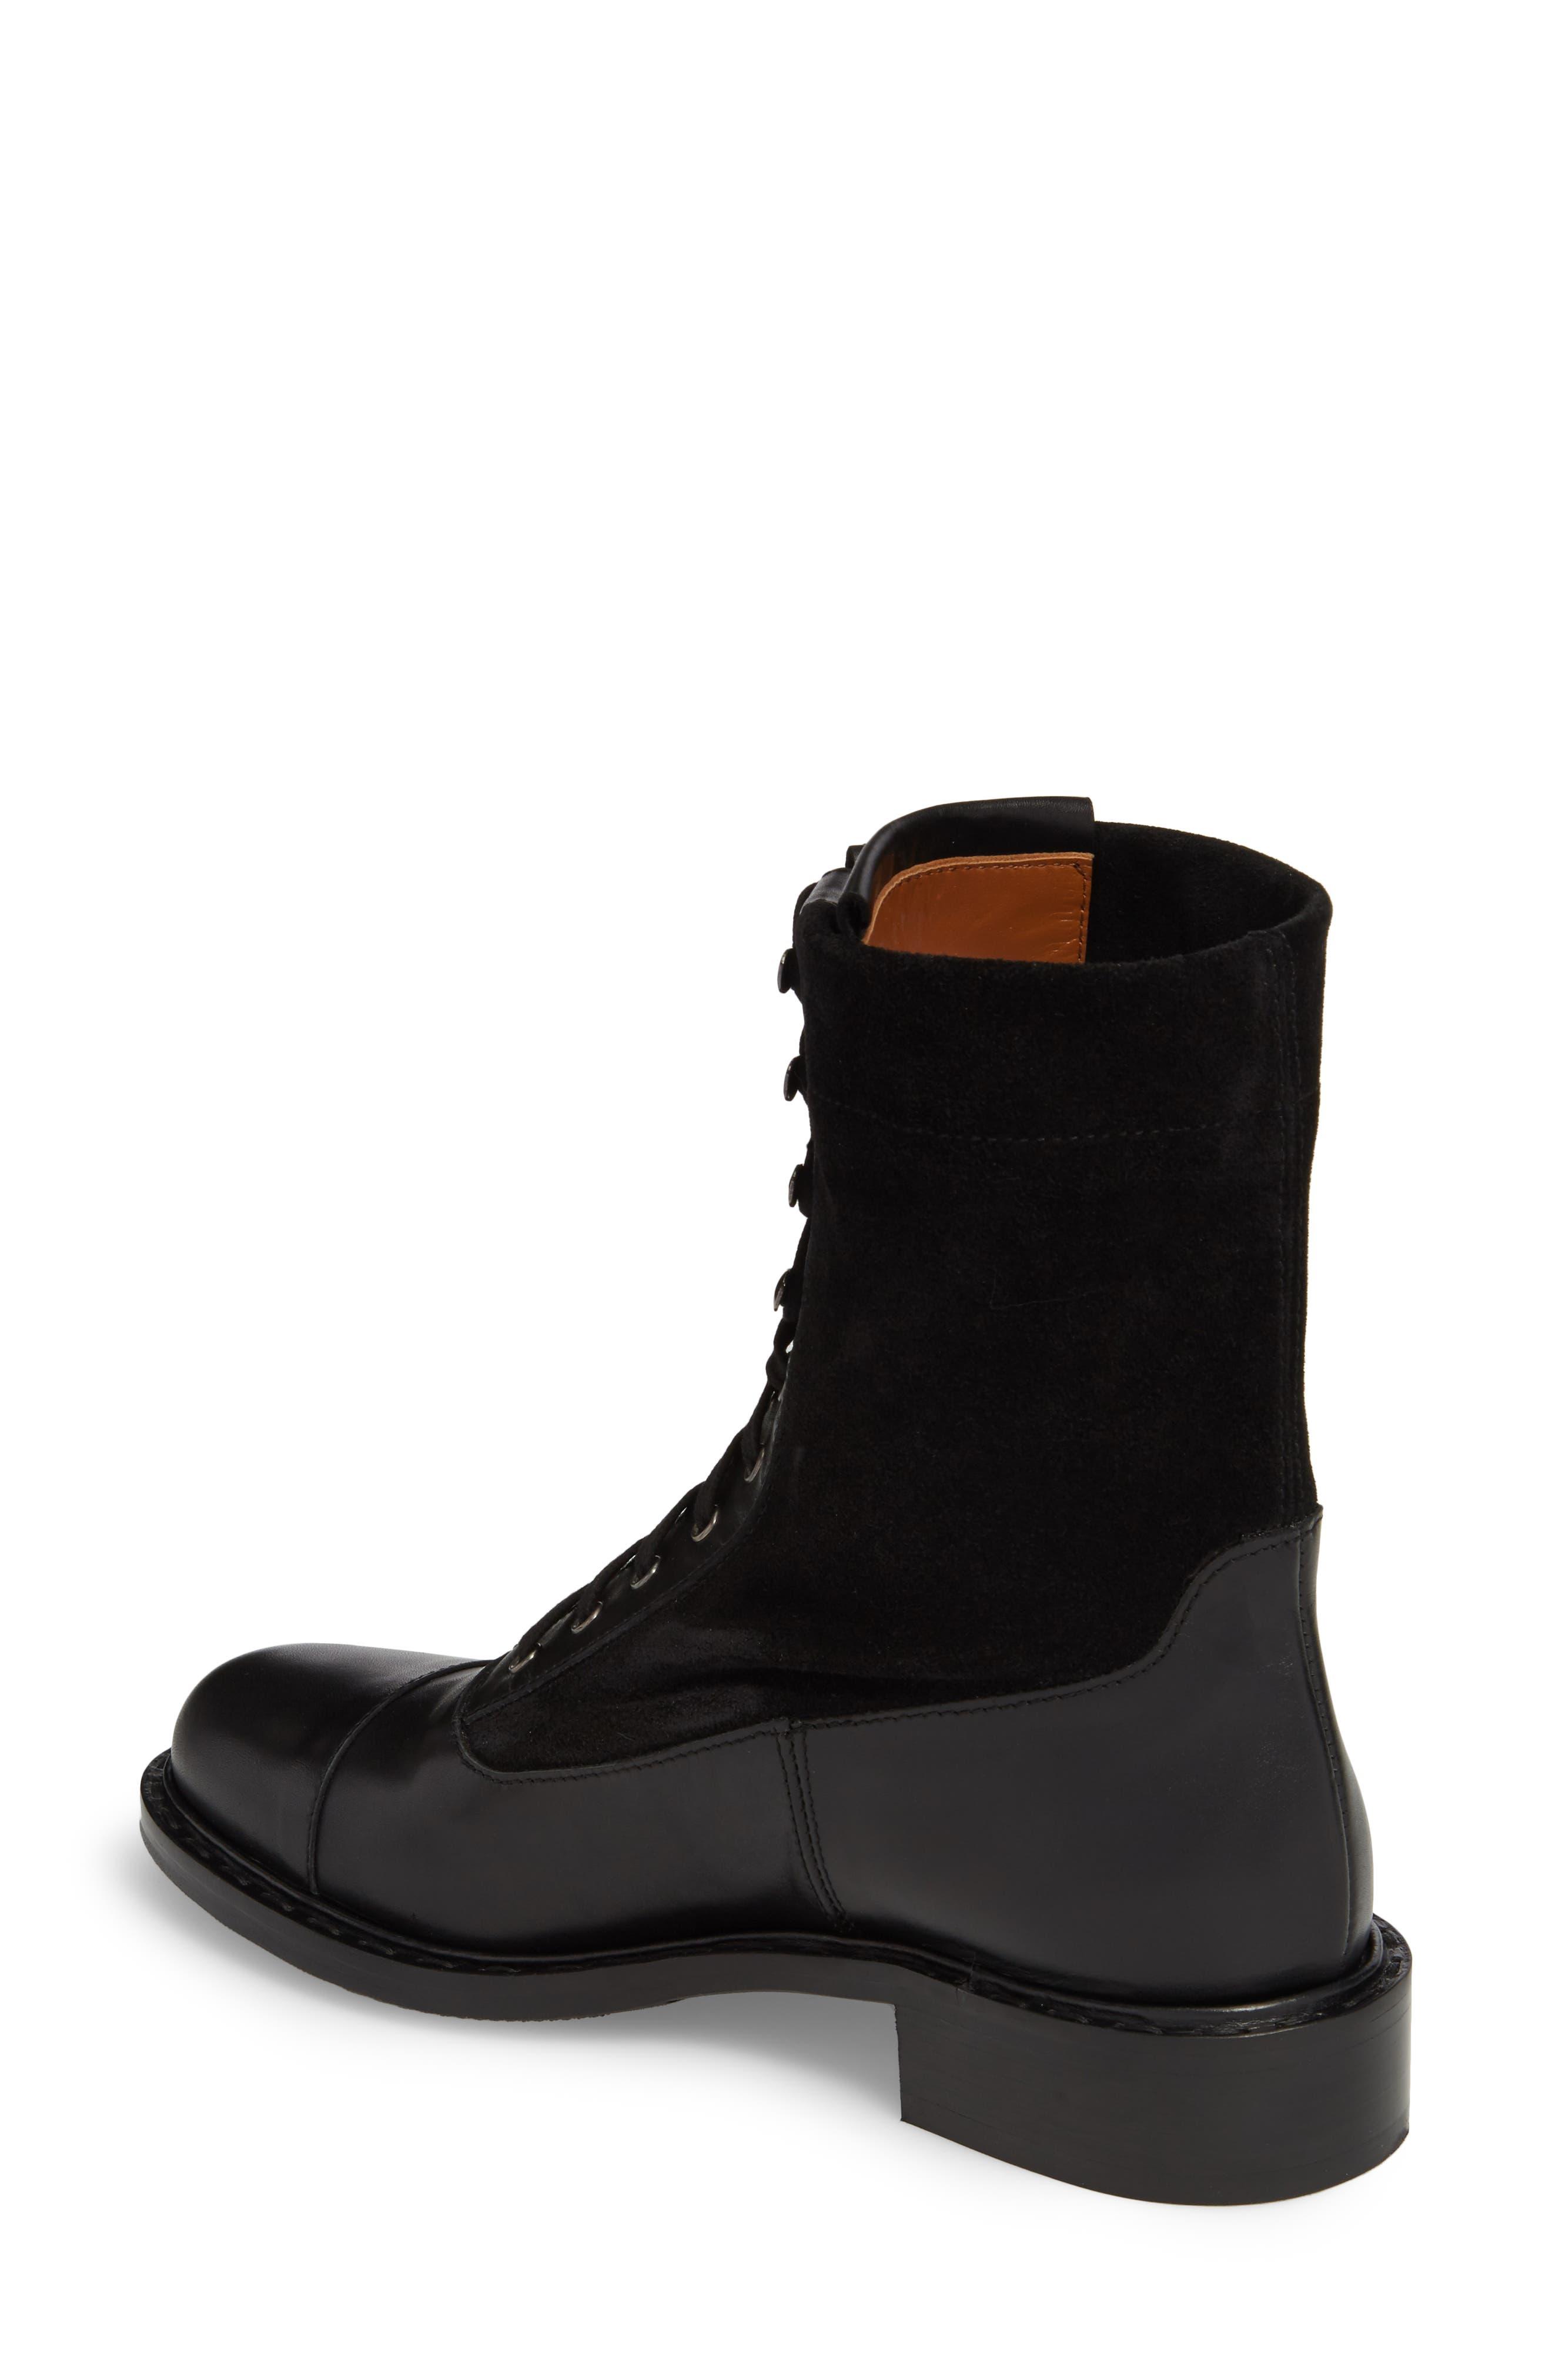 Brigitta Weatherproof Boot,                             Alternate thumbnail 2, color,                             Black/ Black